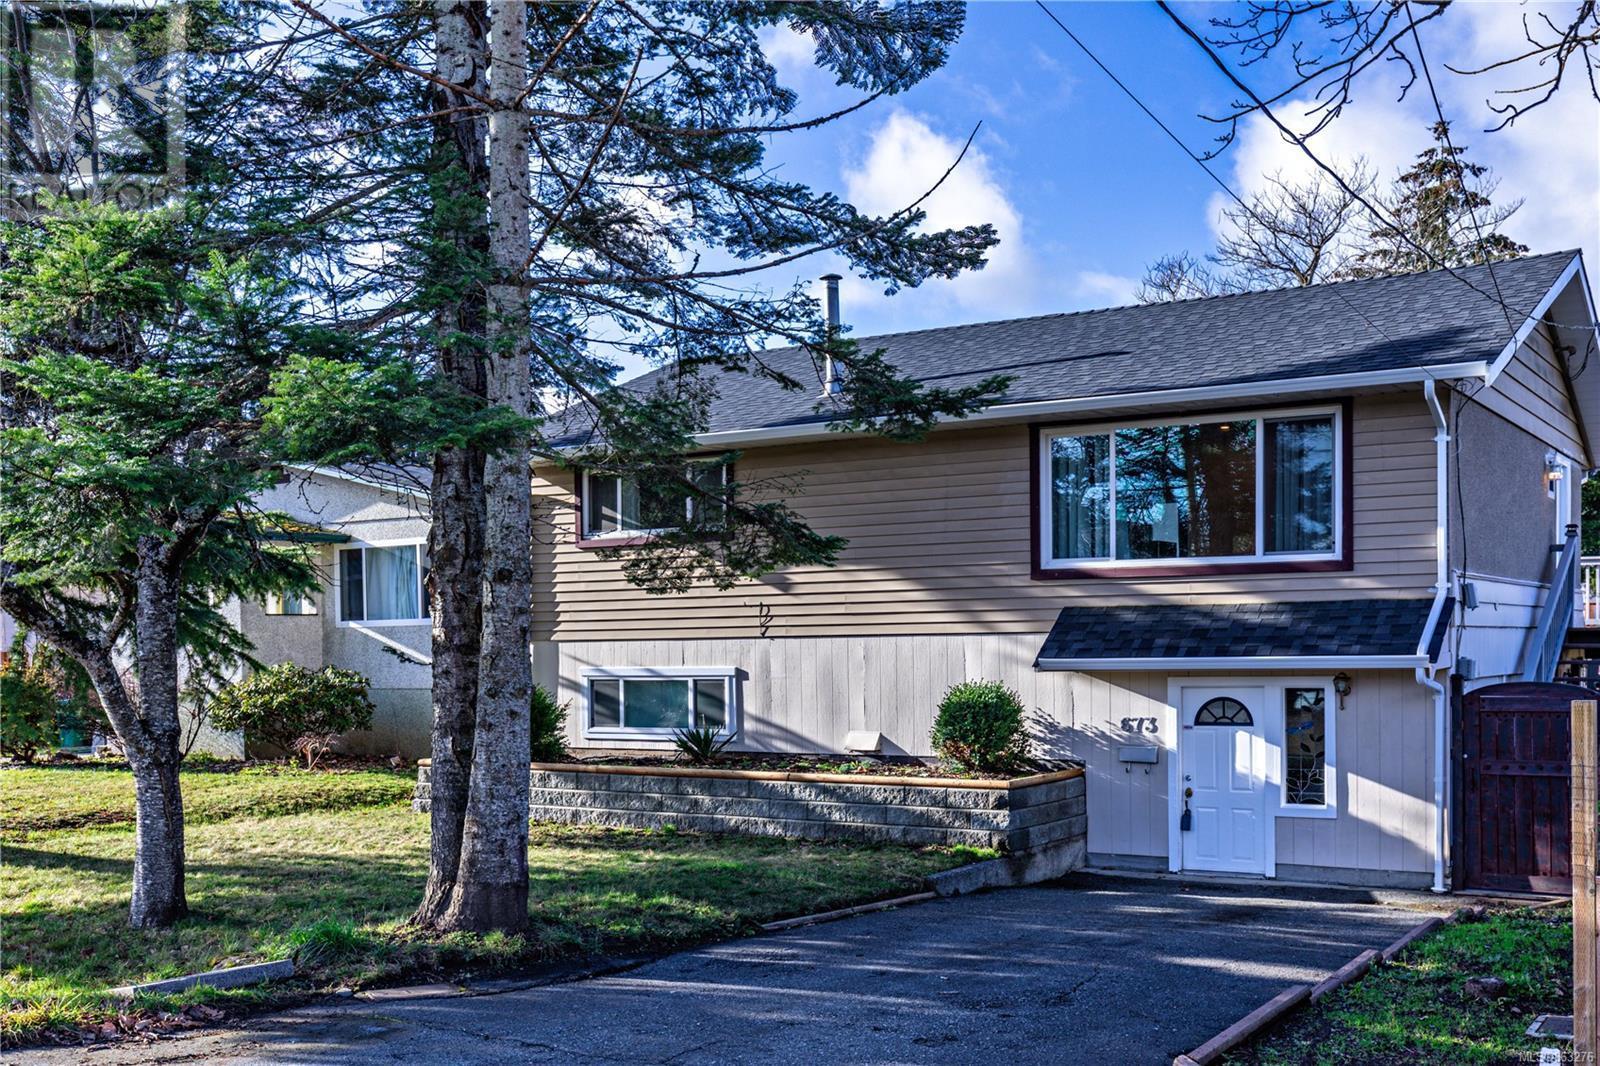 673 Winchester Ave, Nanaimo, British Columbia  V9R 4B6 - Photo 1 - 863276